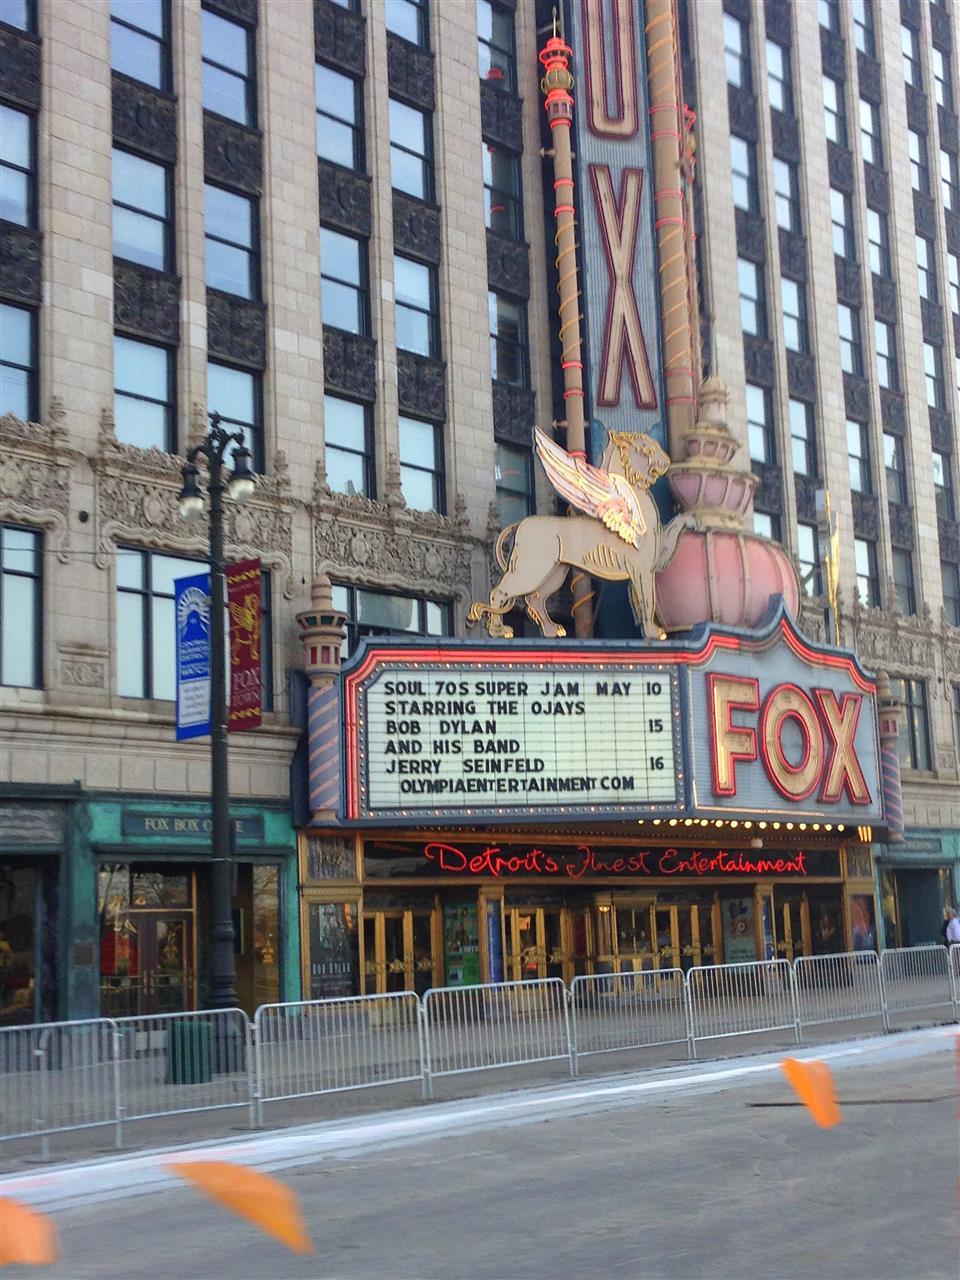 Fox Theatre,  an ornate performing arts center located near the Grand Circus Park Historic District ~ Detroit, Michigan #LeadingRElocal #Detroit #Michigan